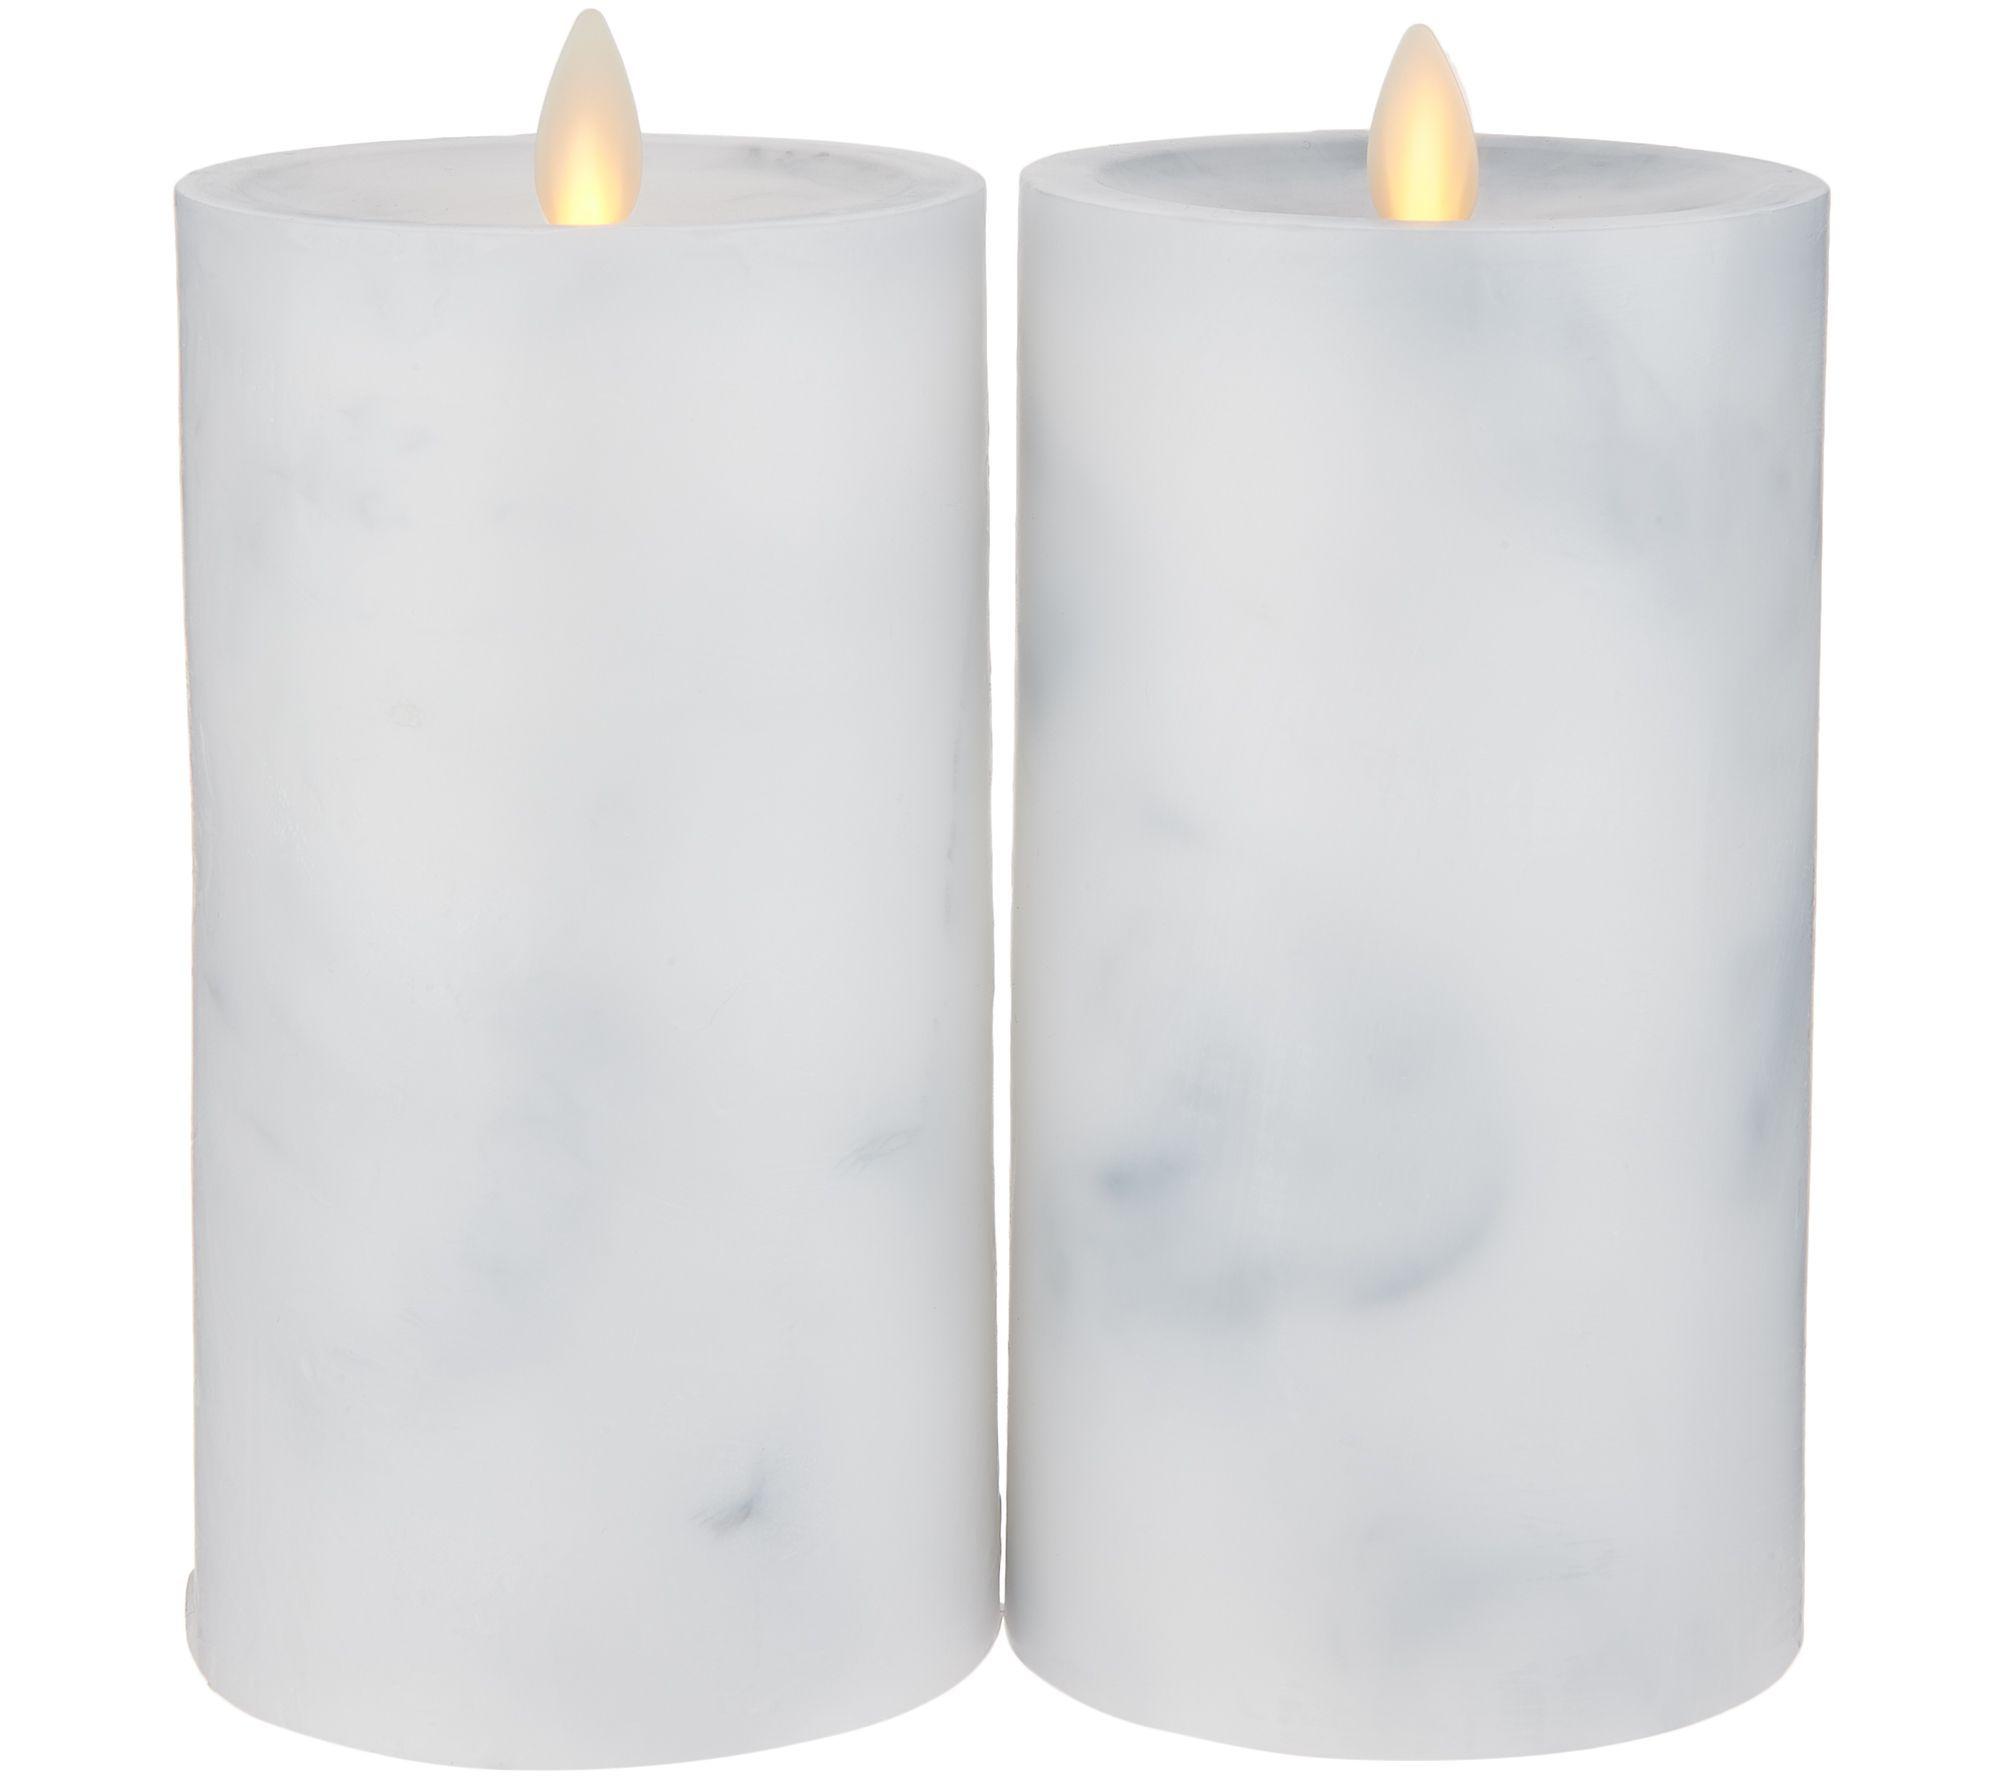 Pin By Tiffany Martin On Home Decor Pillar Candles Candles Pillars